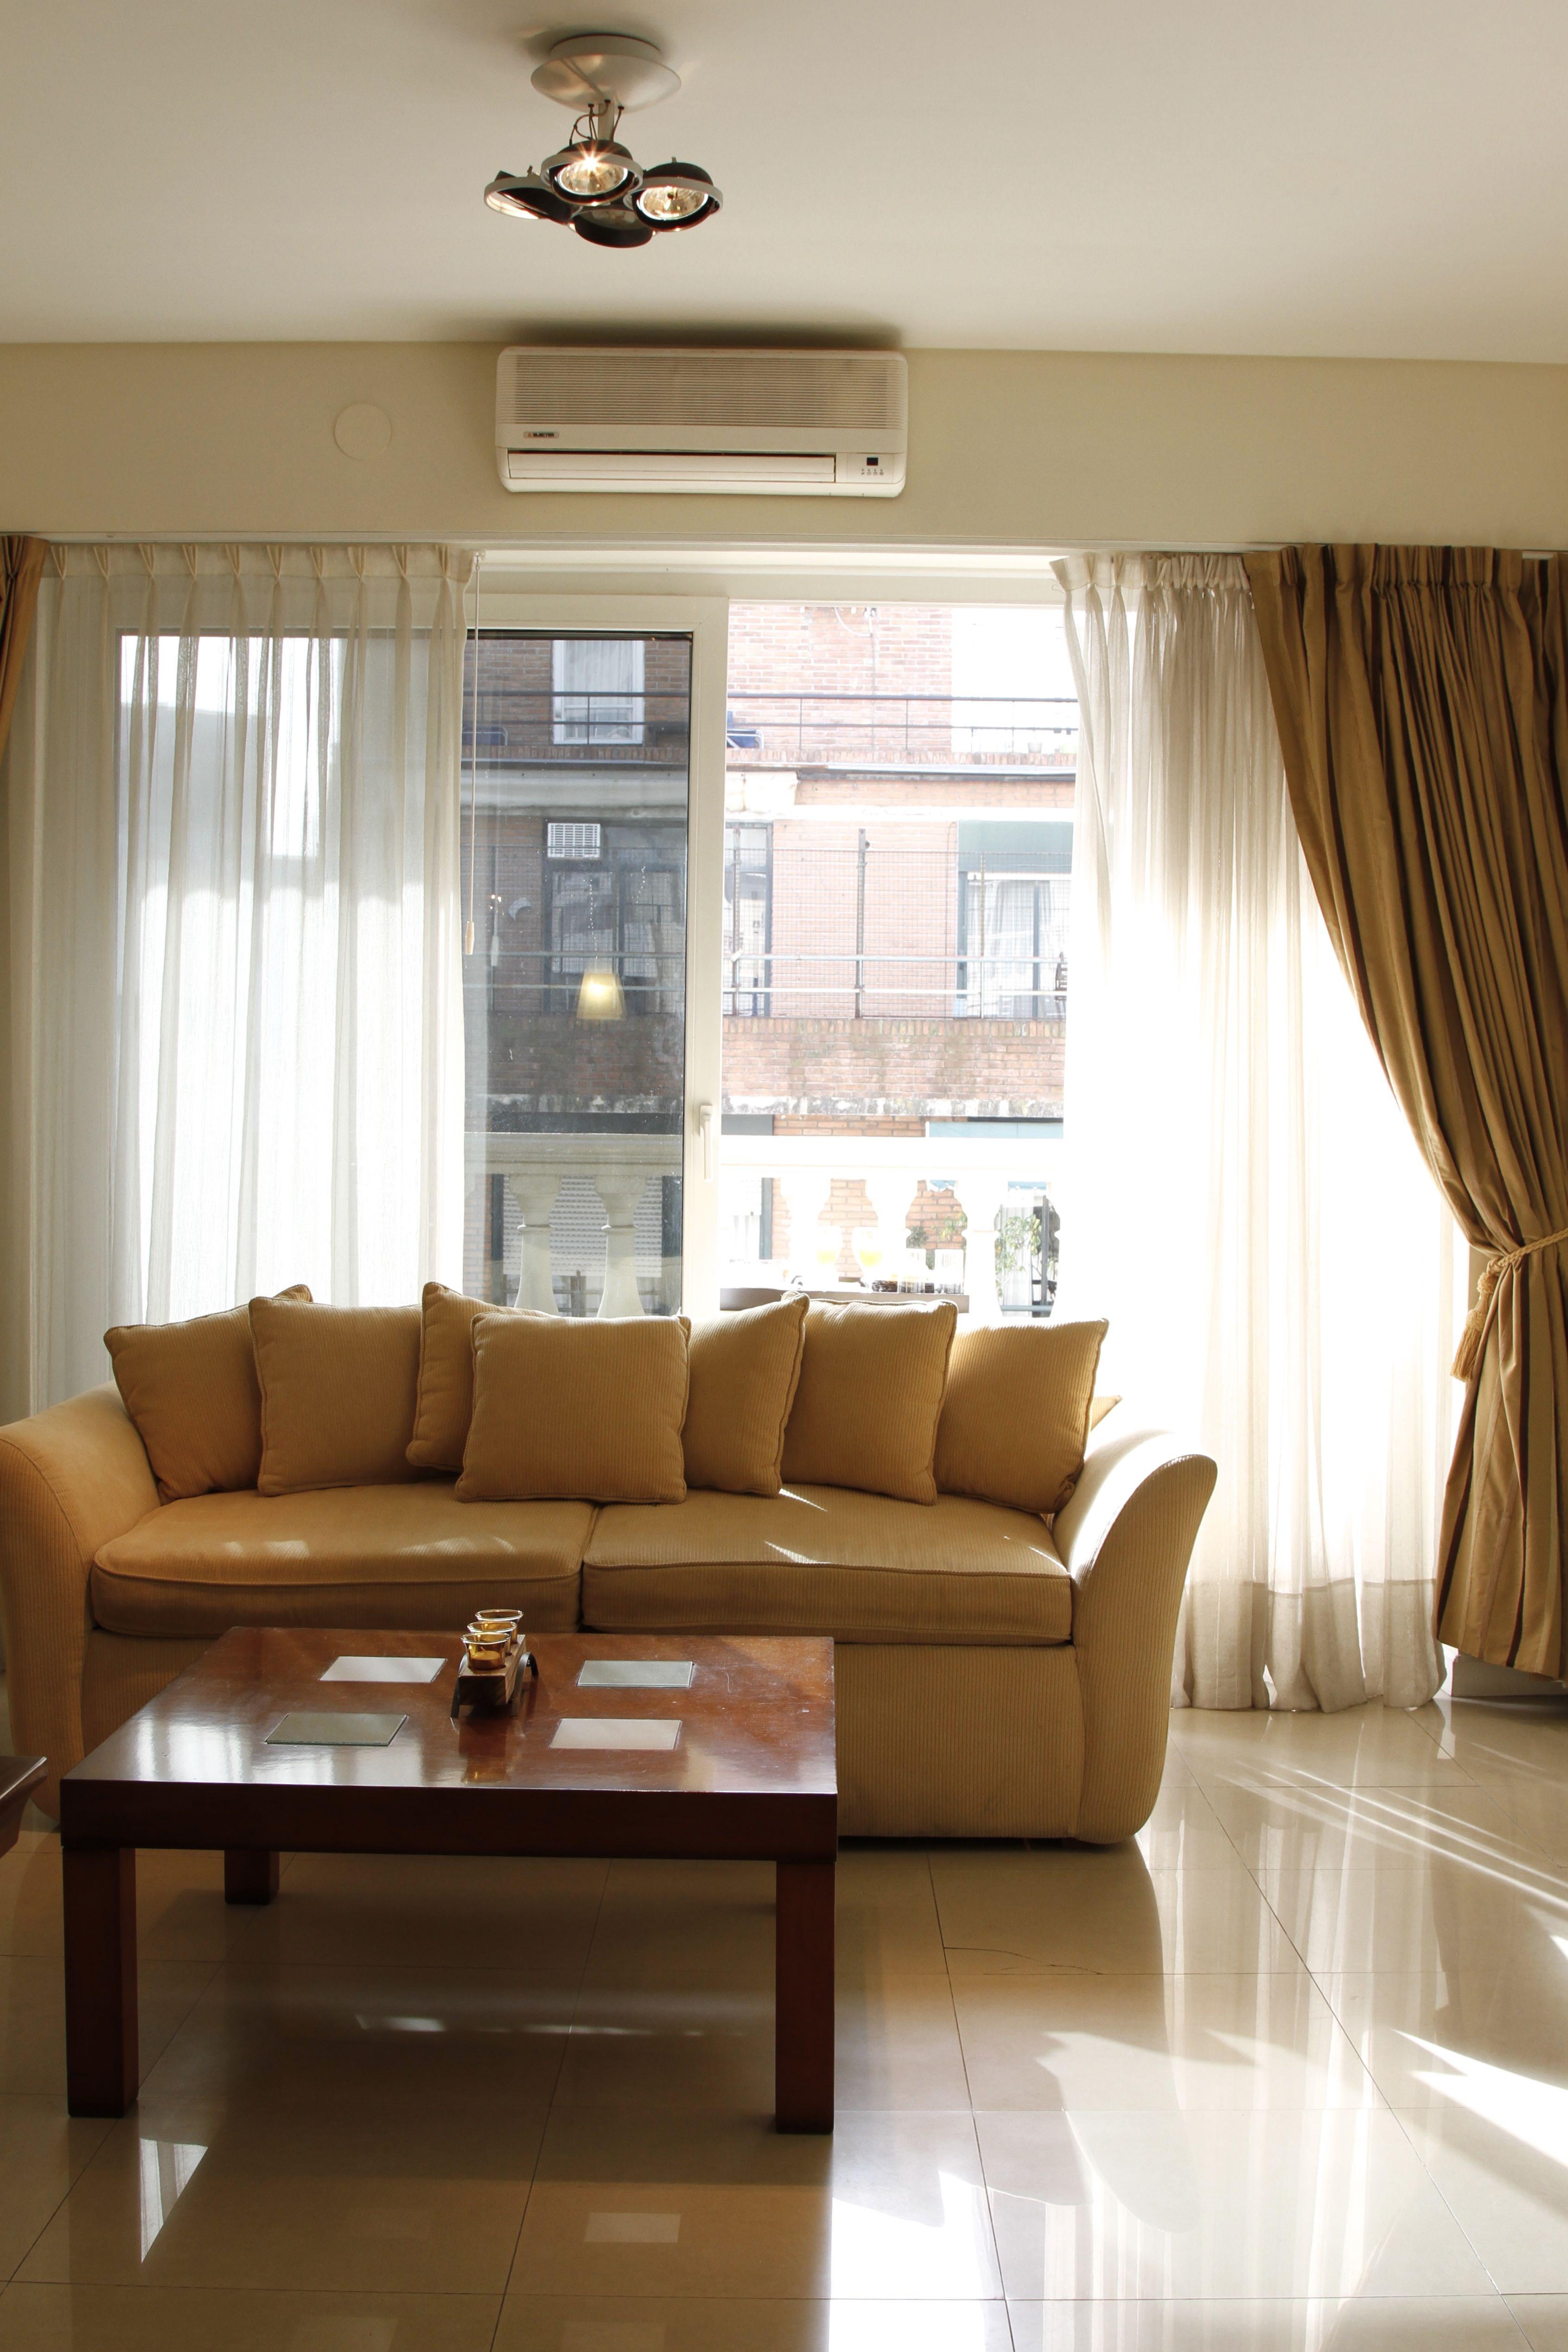 S-Balconi (2).jpg